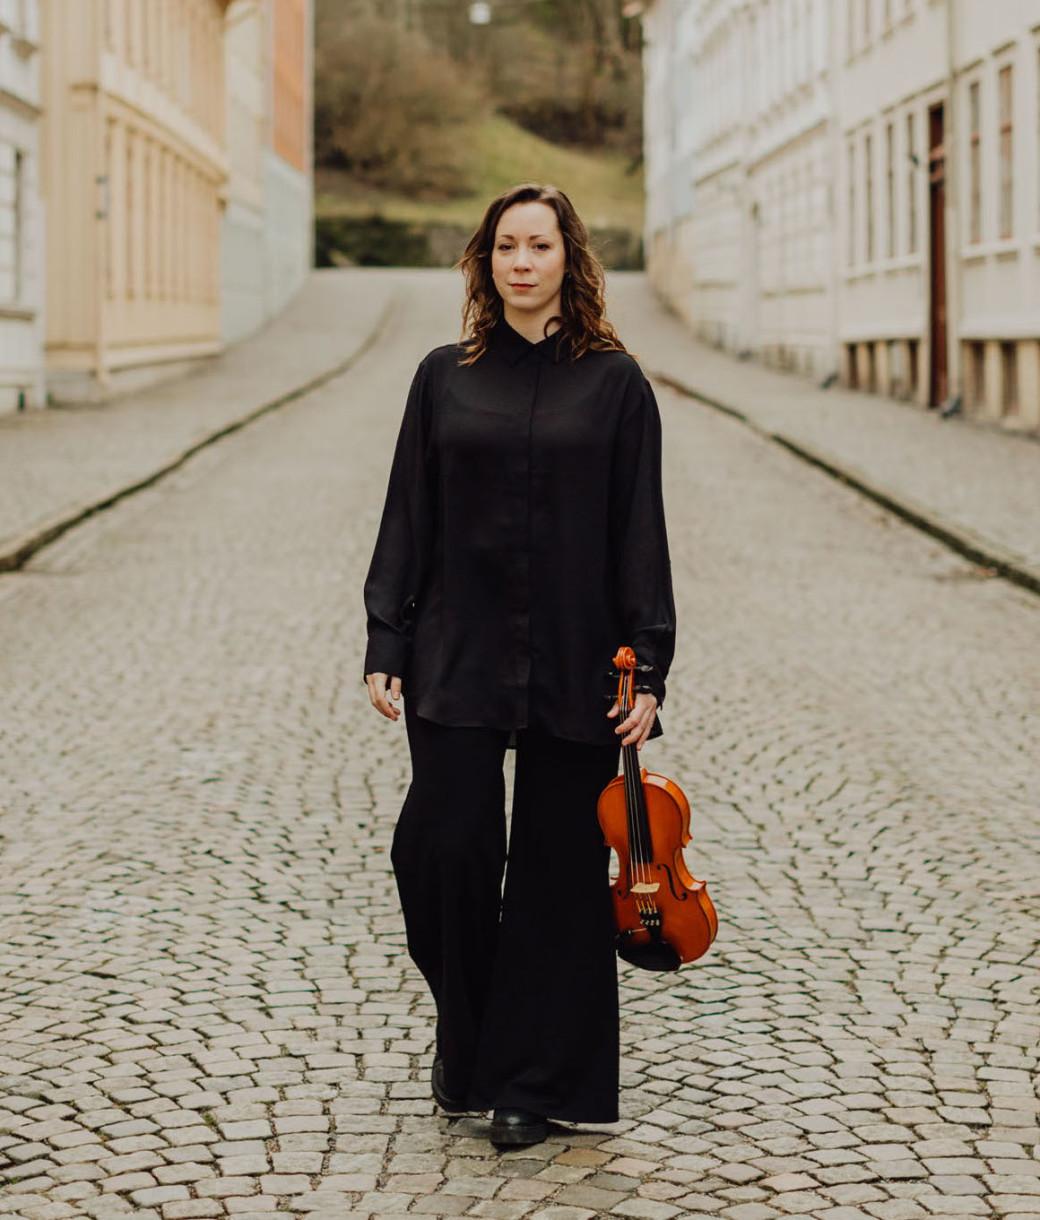 FotografEmmaIvarsson_200108_TLE-1 WEBB